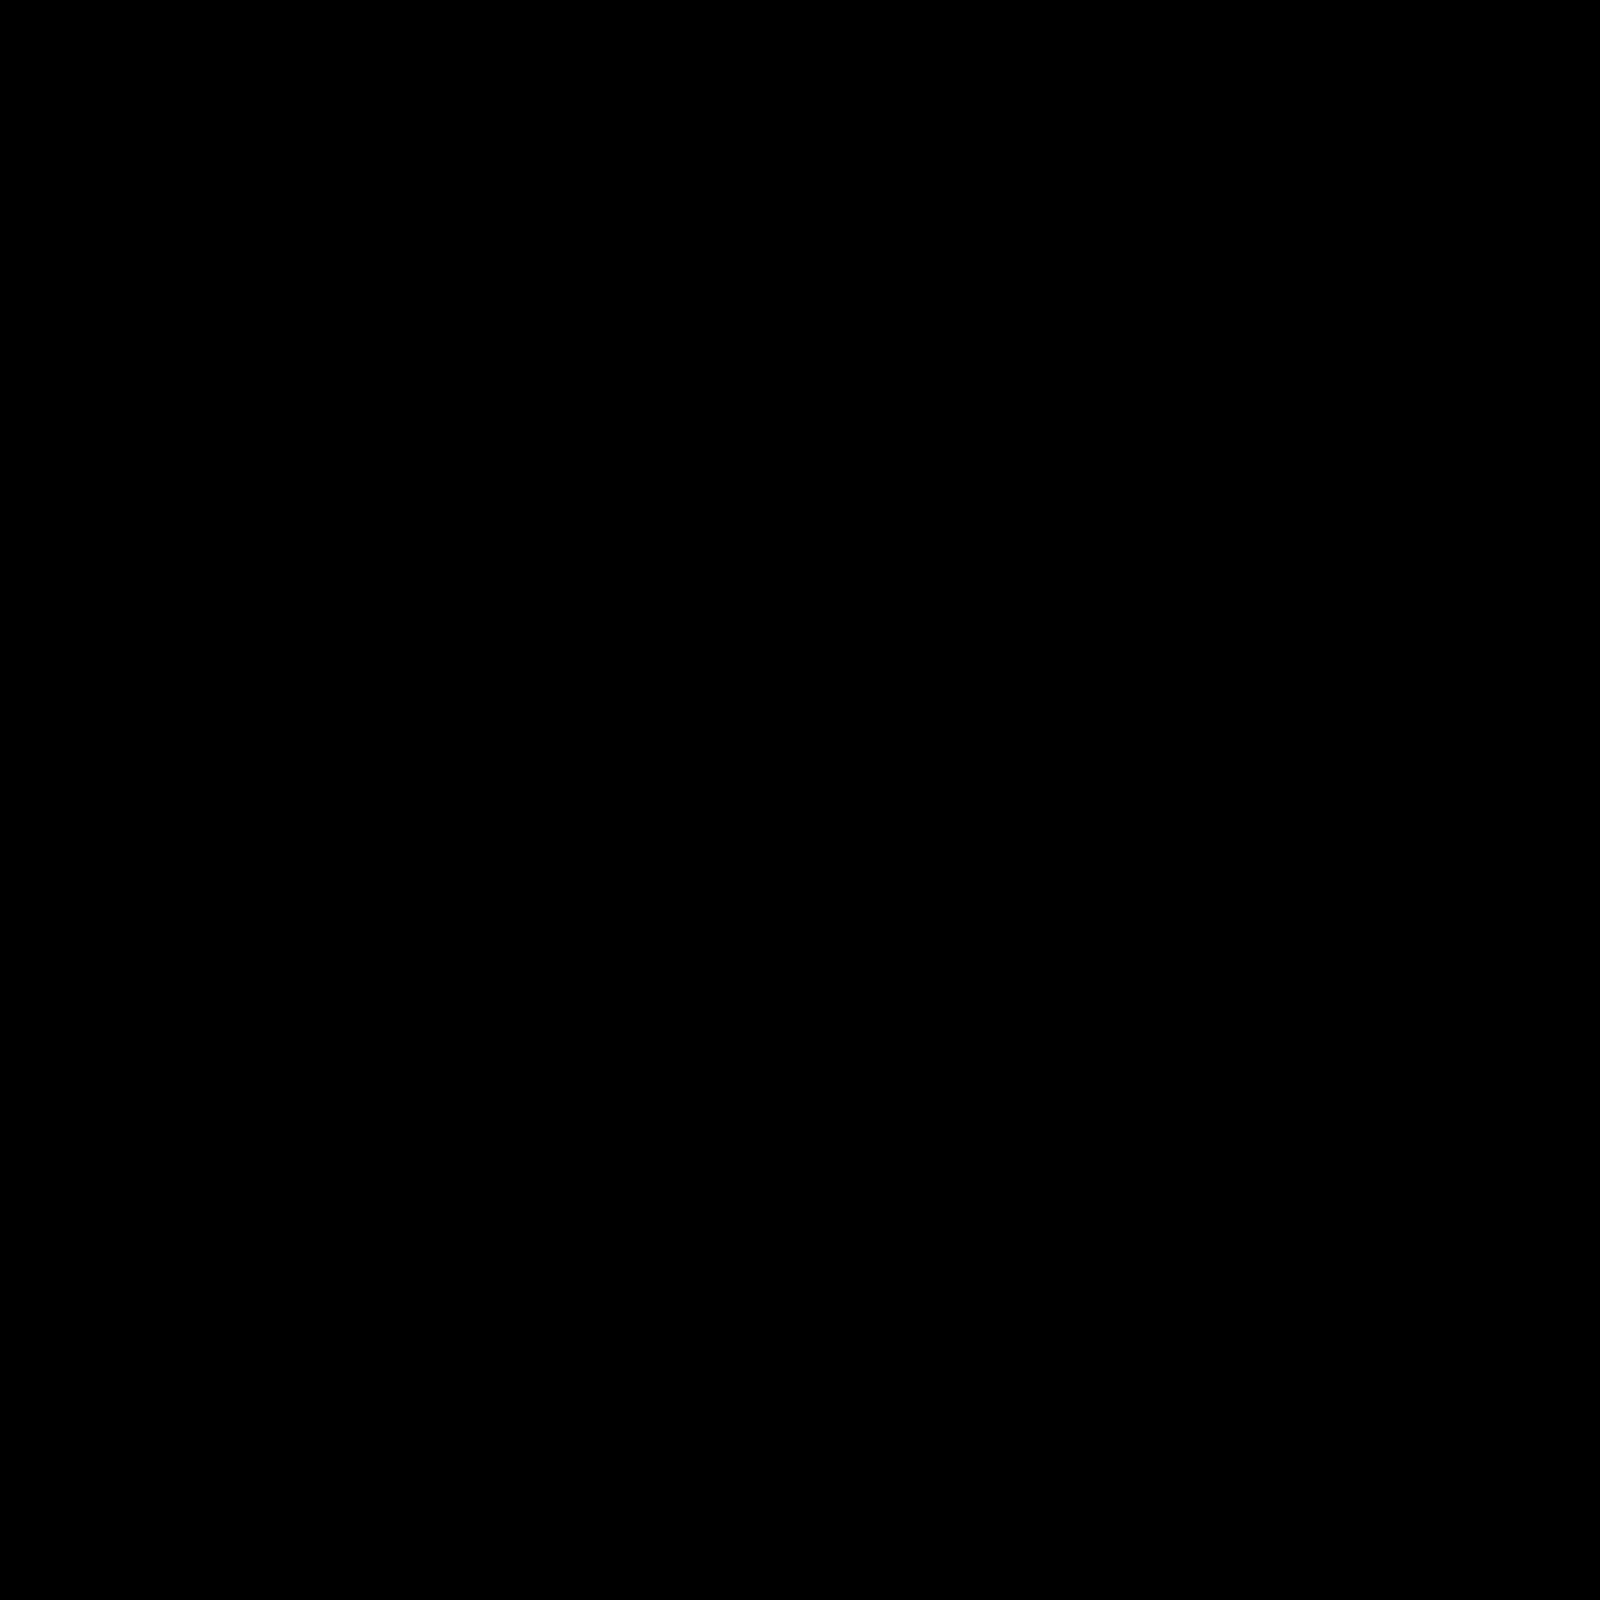 Logo Autocad PNG - 98150